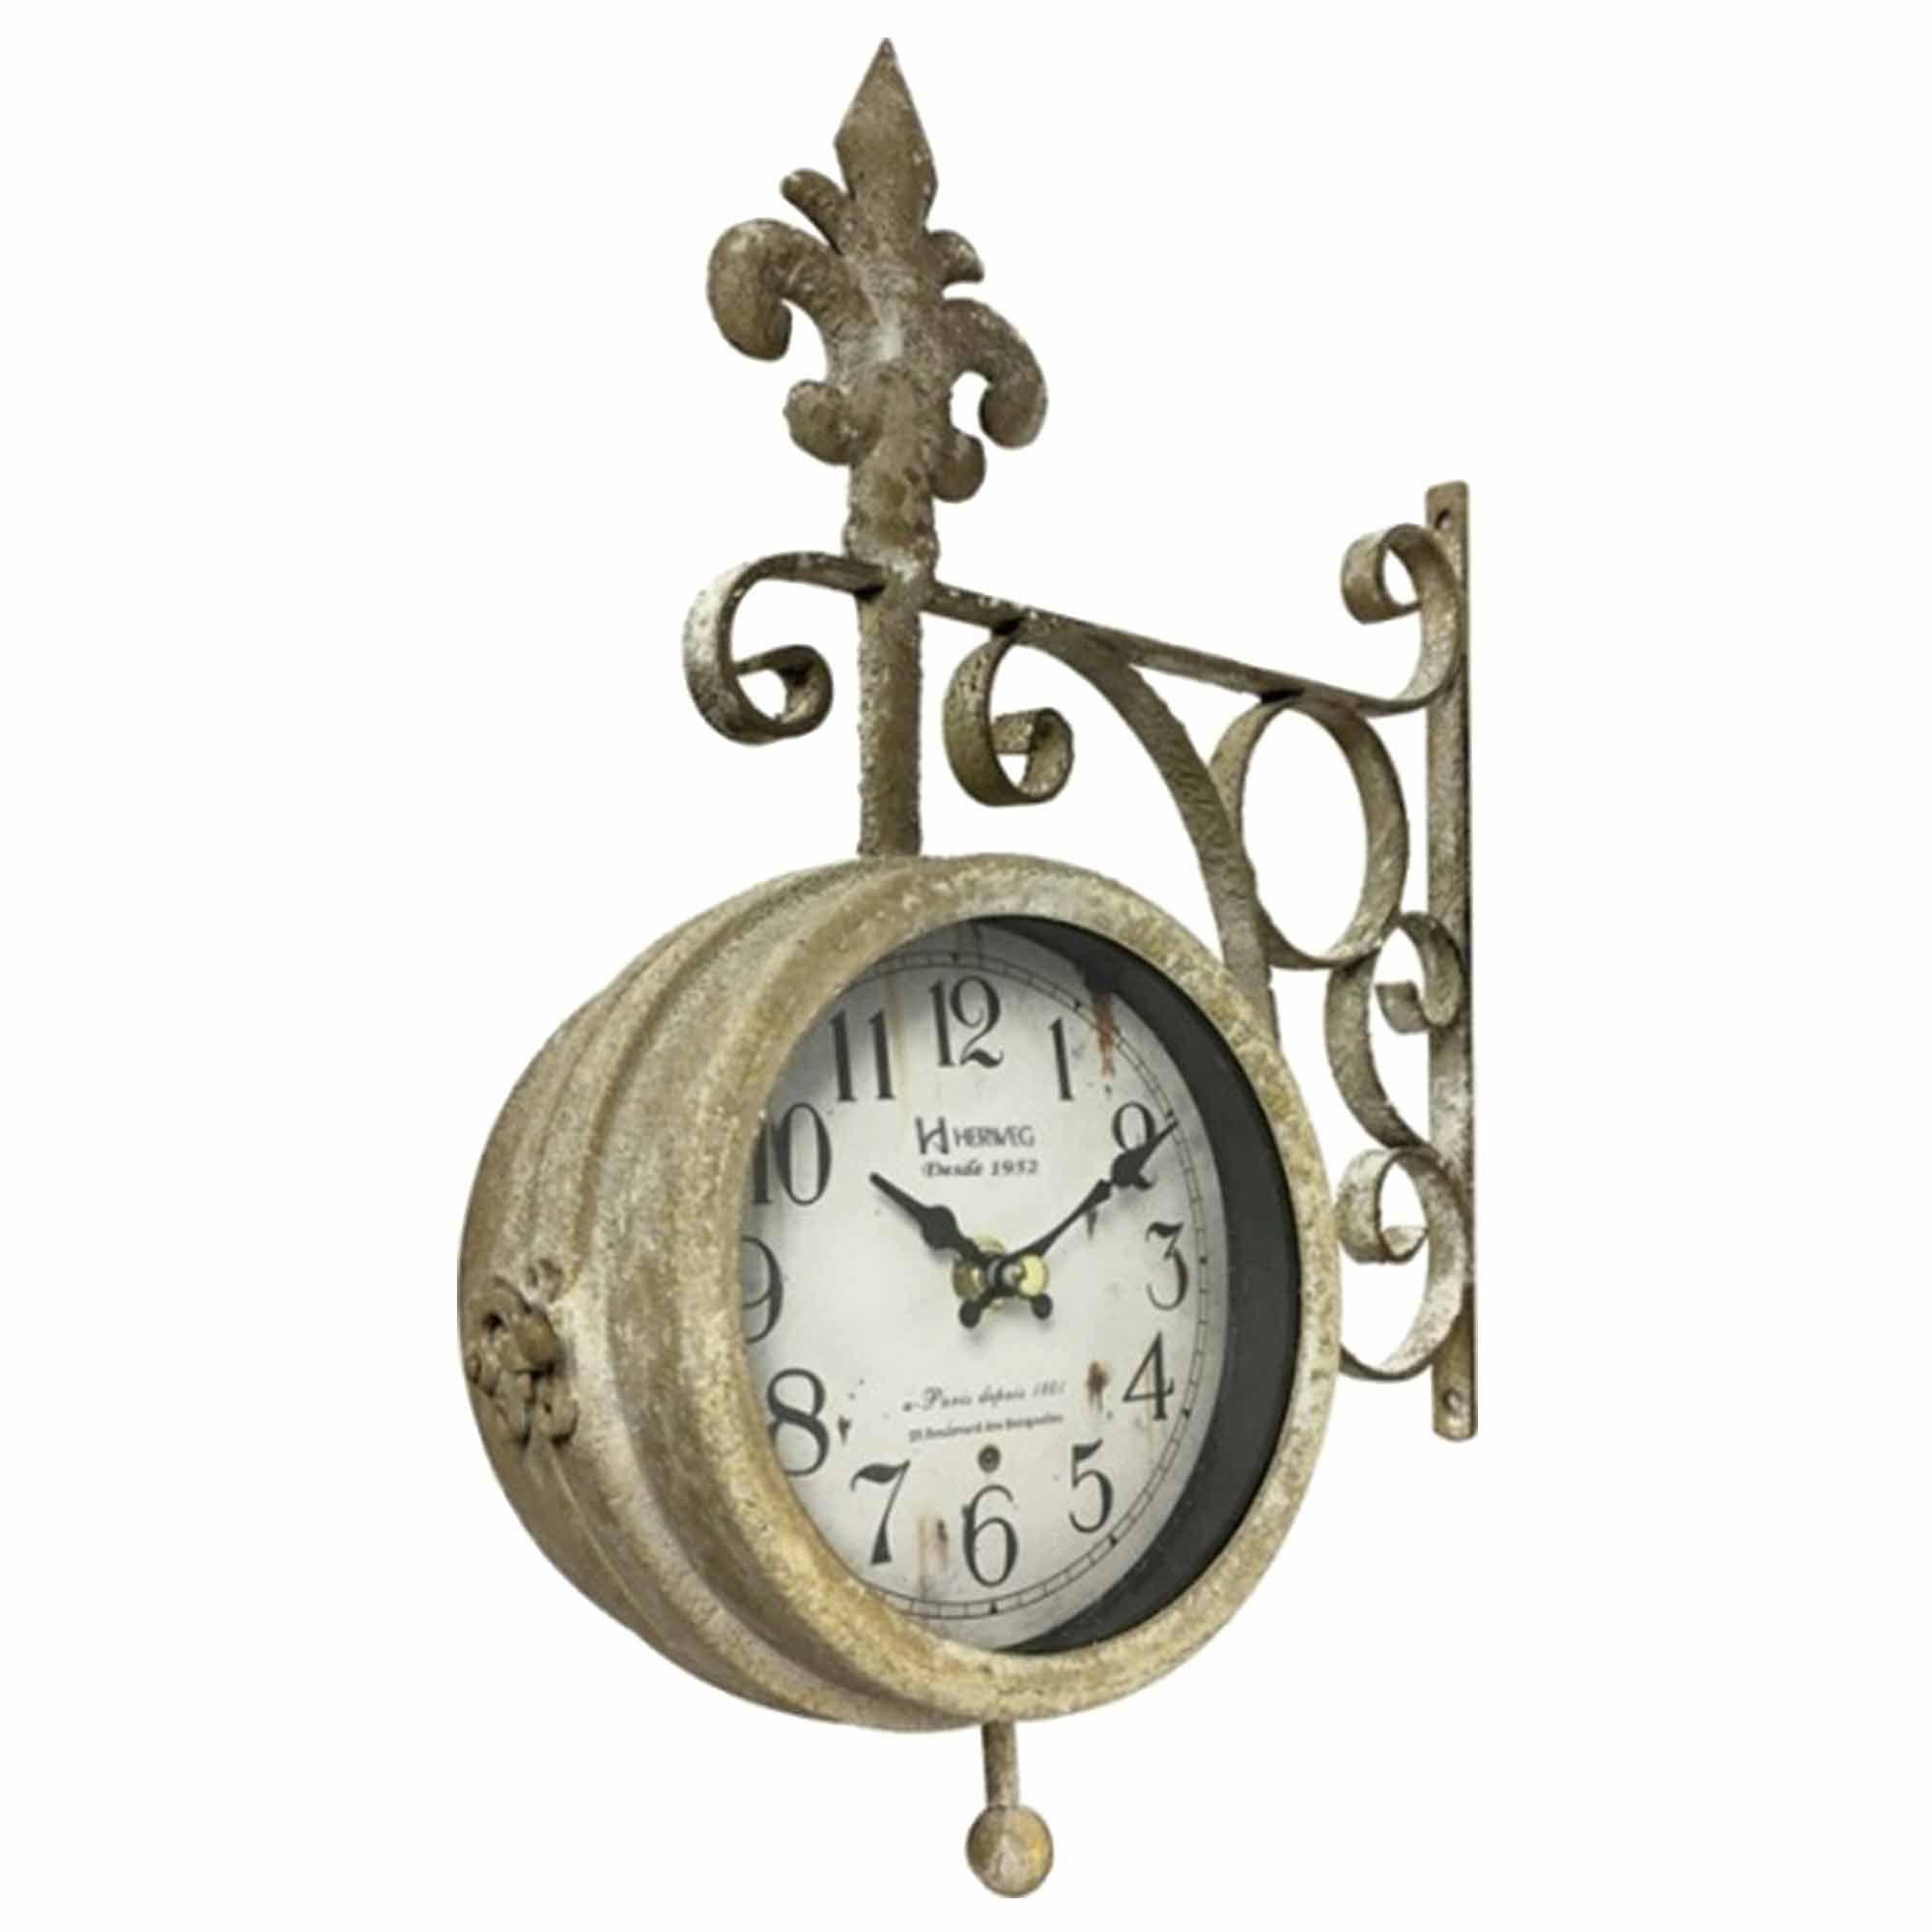 Relógio de Parede Jardim Herweg 6475 999 Natural